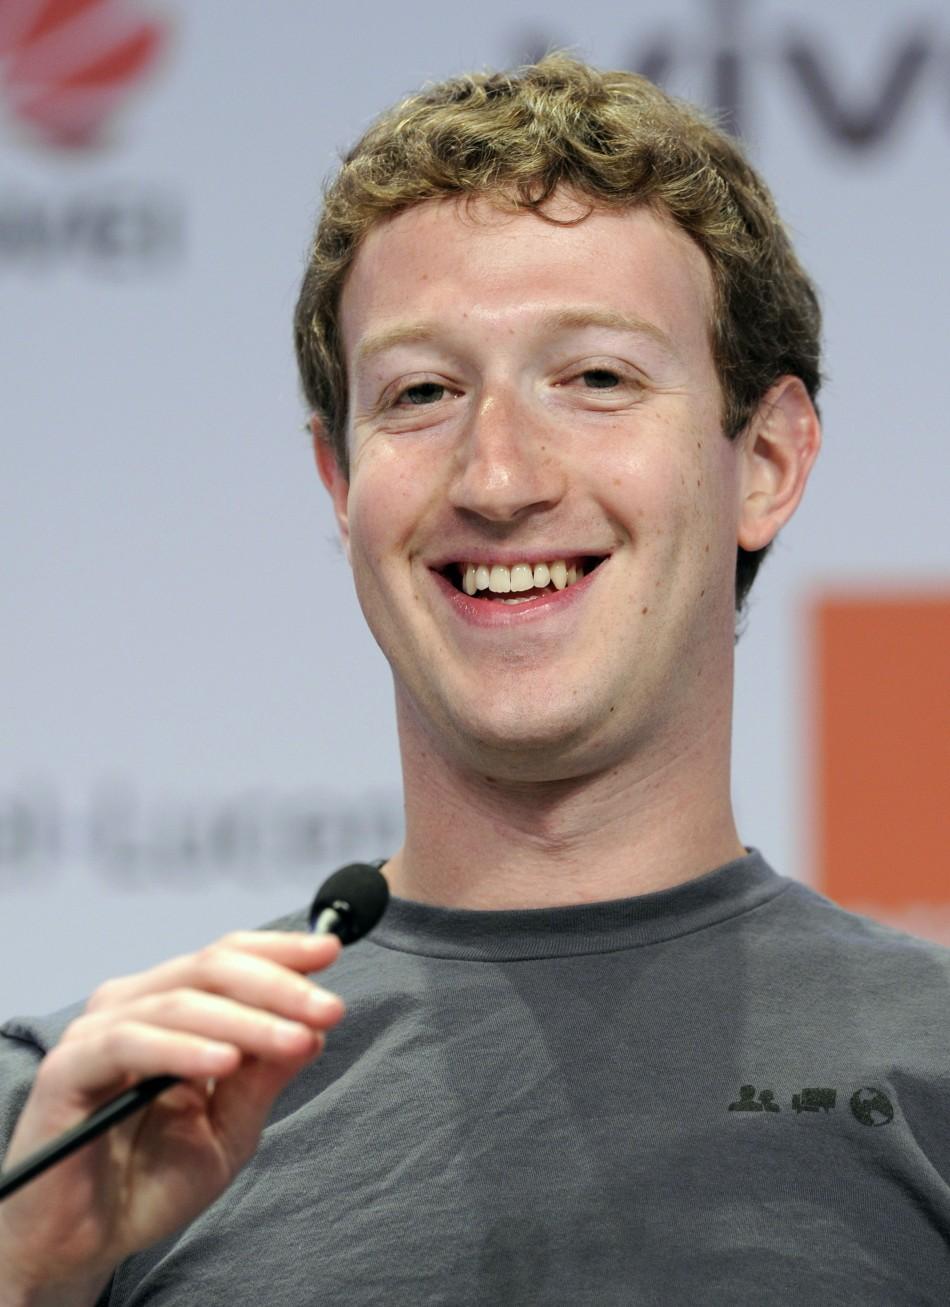 Founder And CEO Of Facebook Mark Zuckerberg